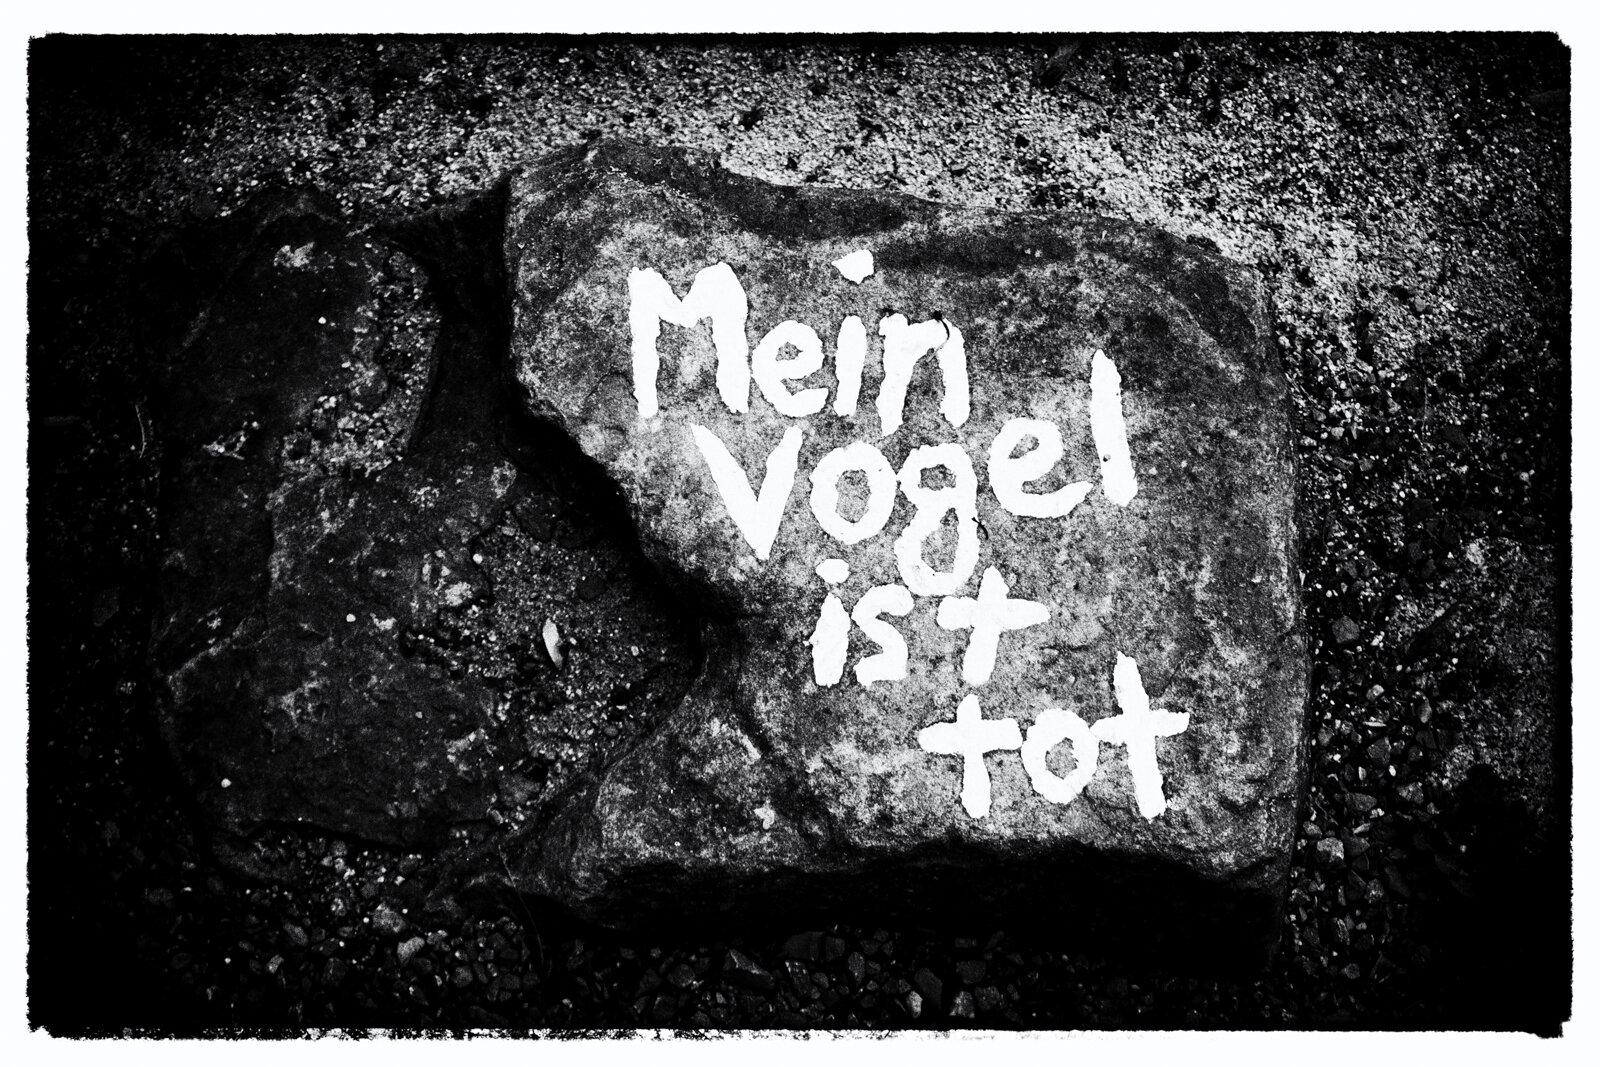 11_DSCF0516_2014_04Friedhof-Karlsruhe-Edit____Friedhof-KA.jpg